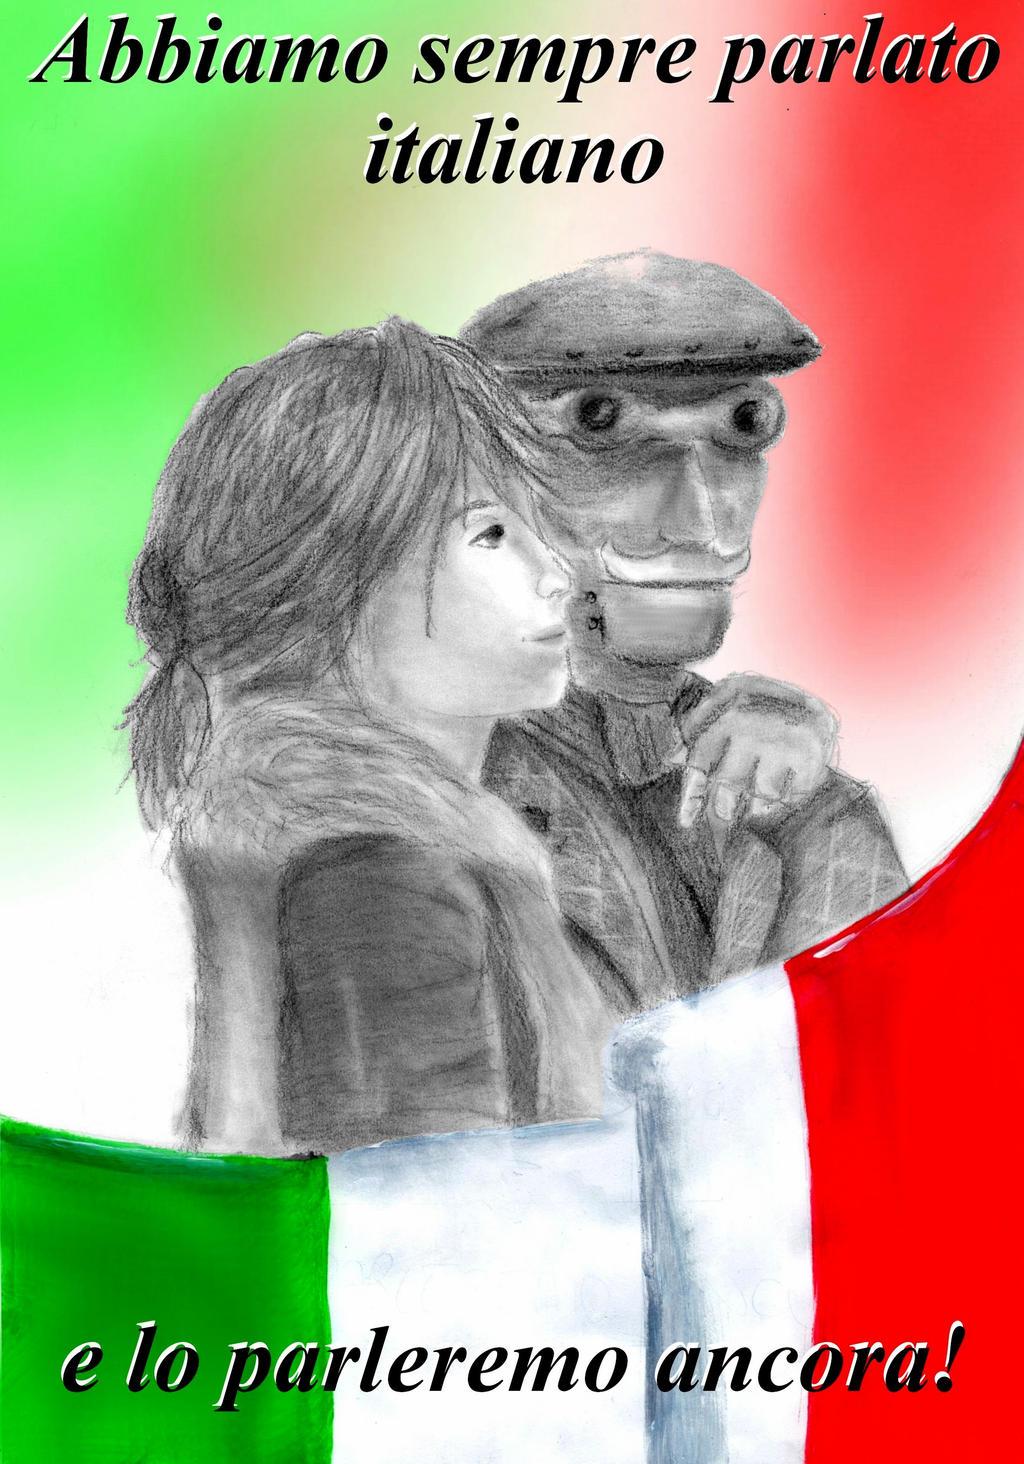 Syberia - Italian Dubbing by LotyLauda